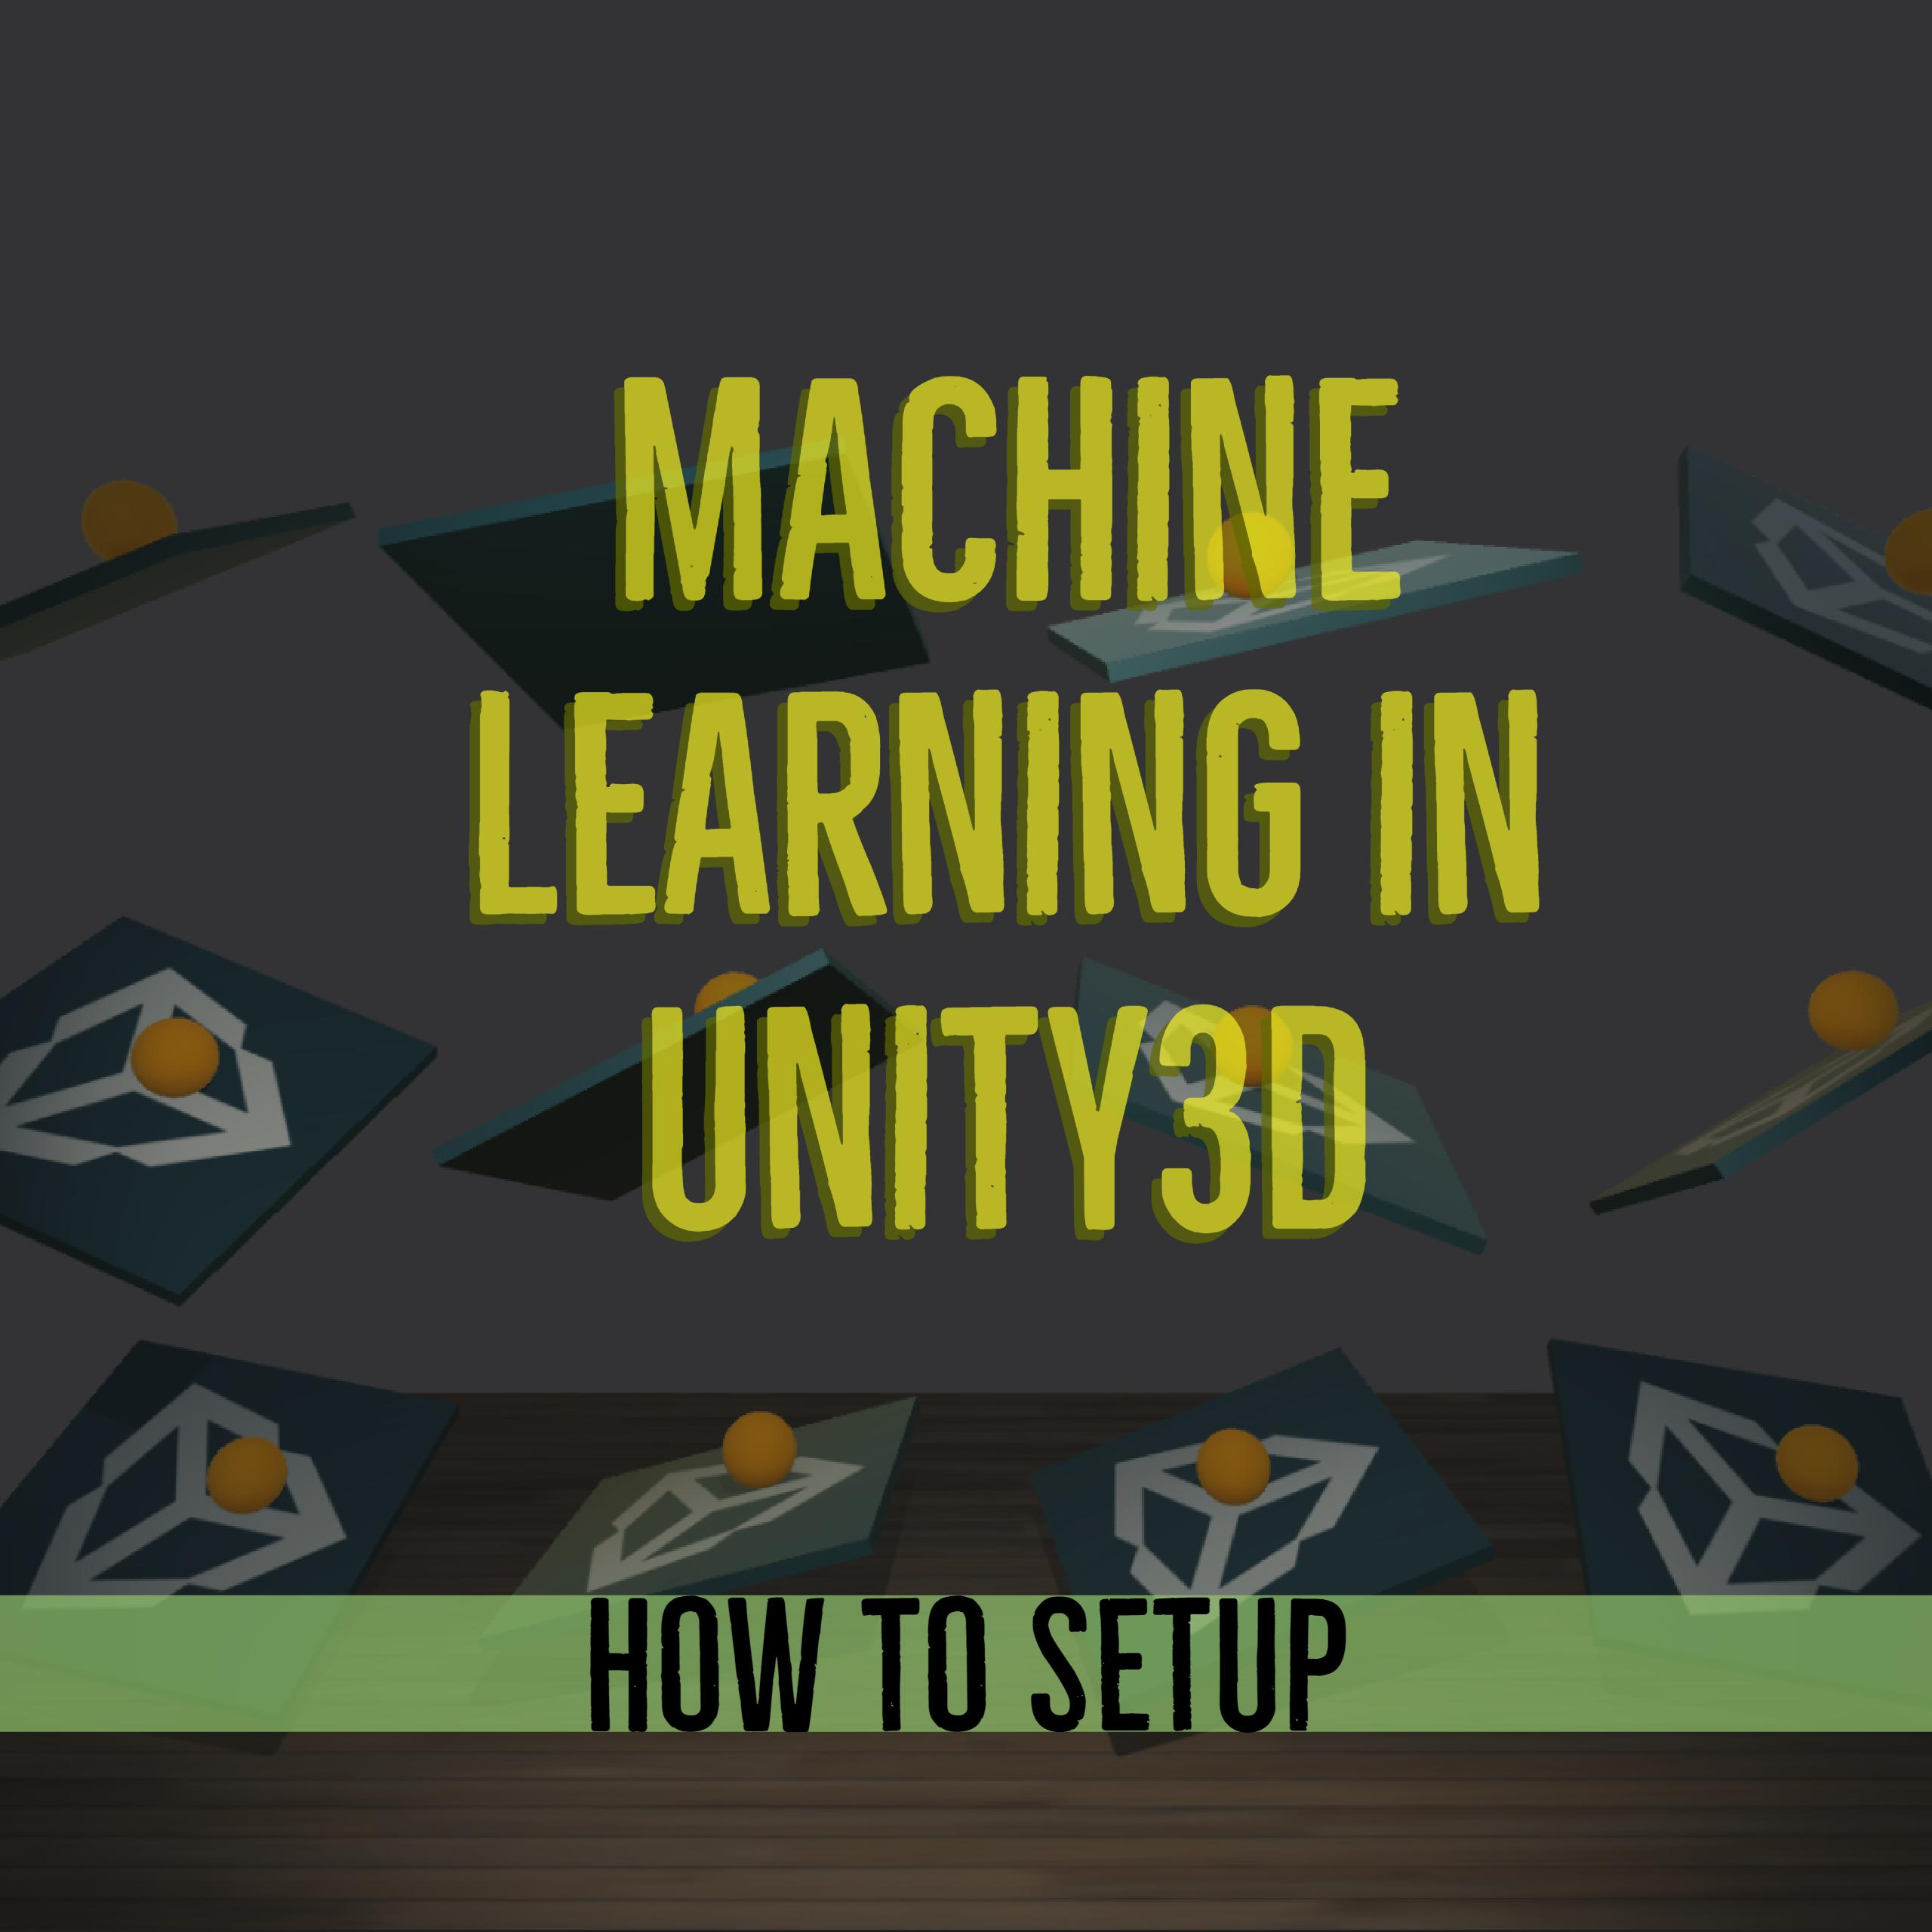 Unity机器学习环境搭建 - Windows 10 篇